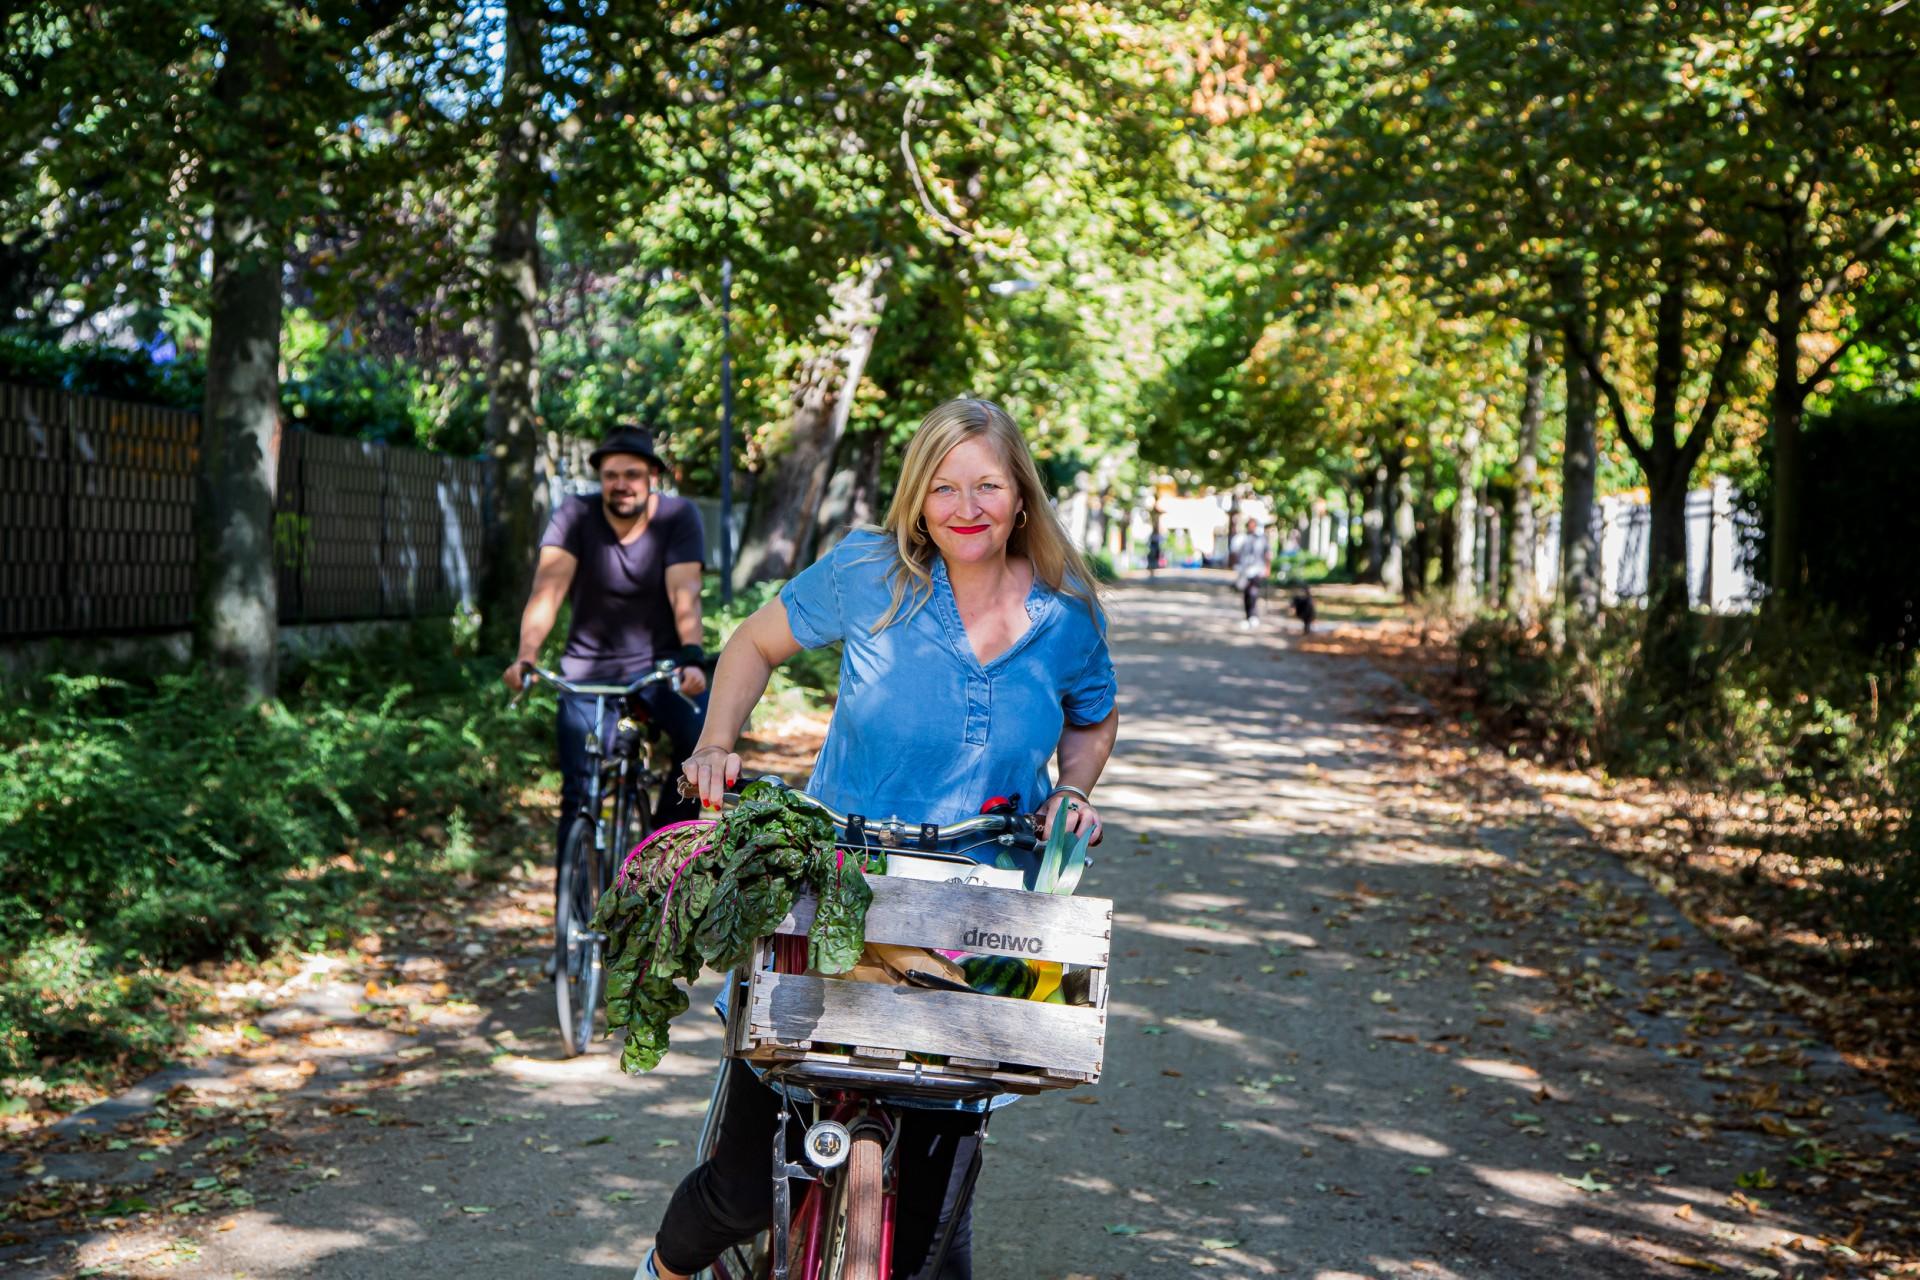 Frau aufeinem Fahrrad, Mann auf einem Fahrrad, Natur, Park